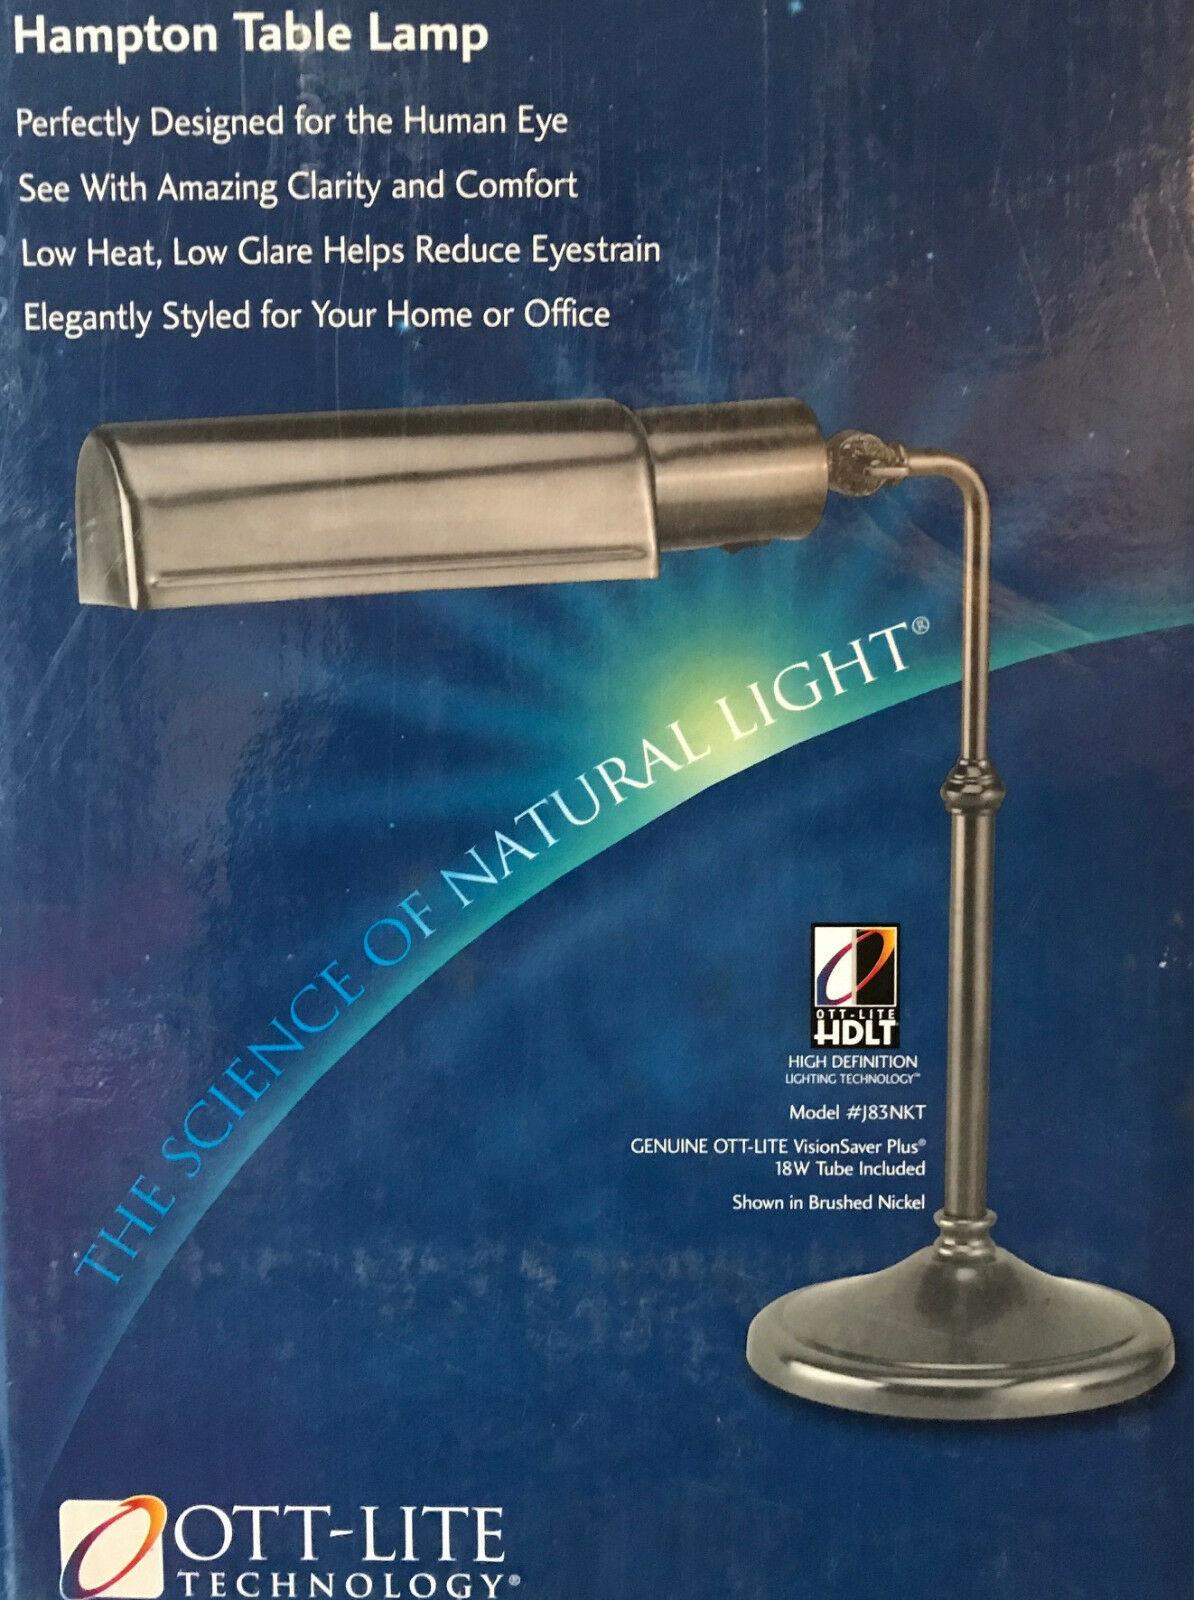 SUN Lamp OTT-LITE Vision Saver Plus Hampton Table Lamp